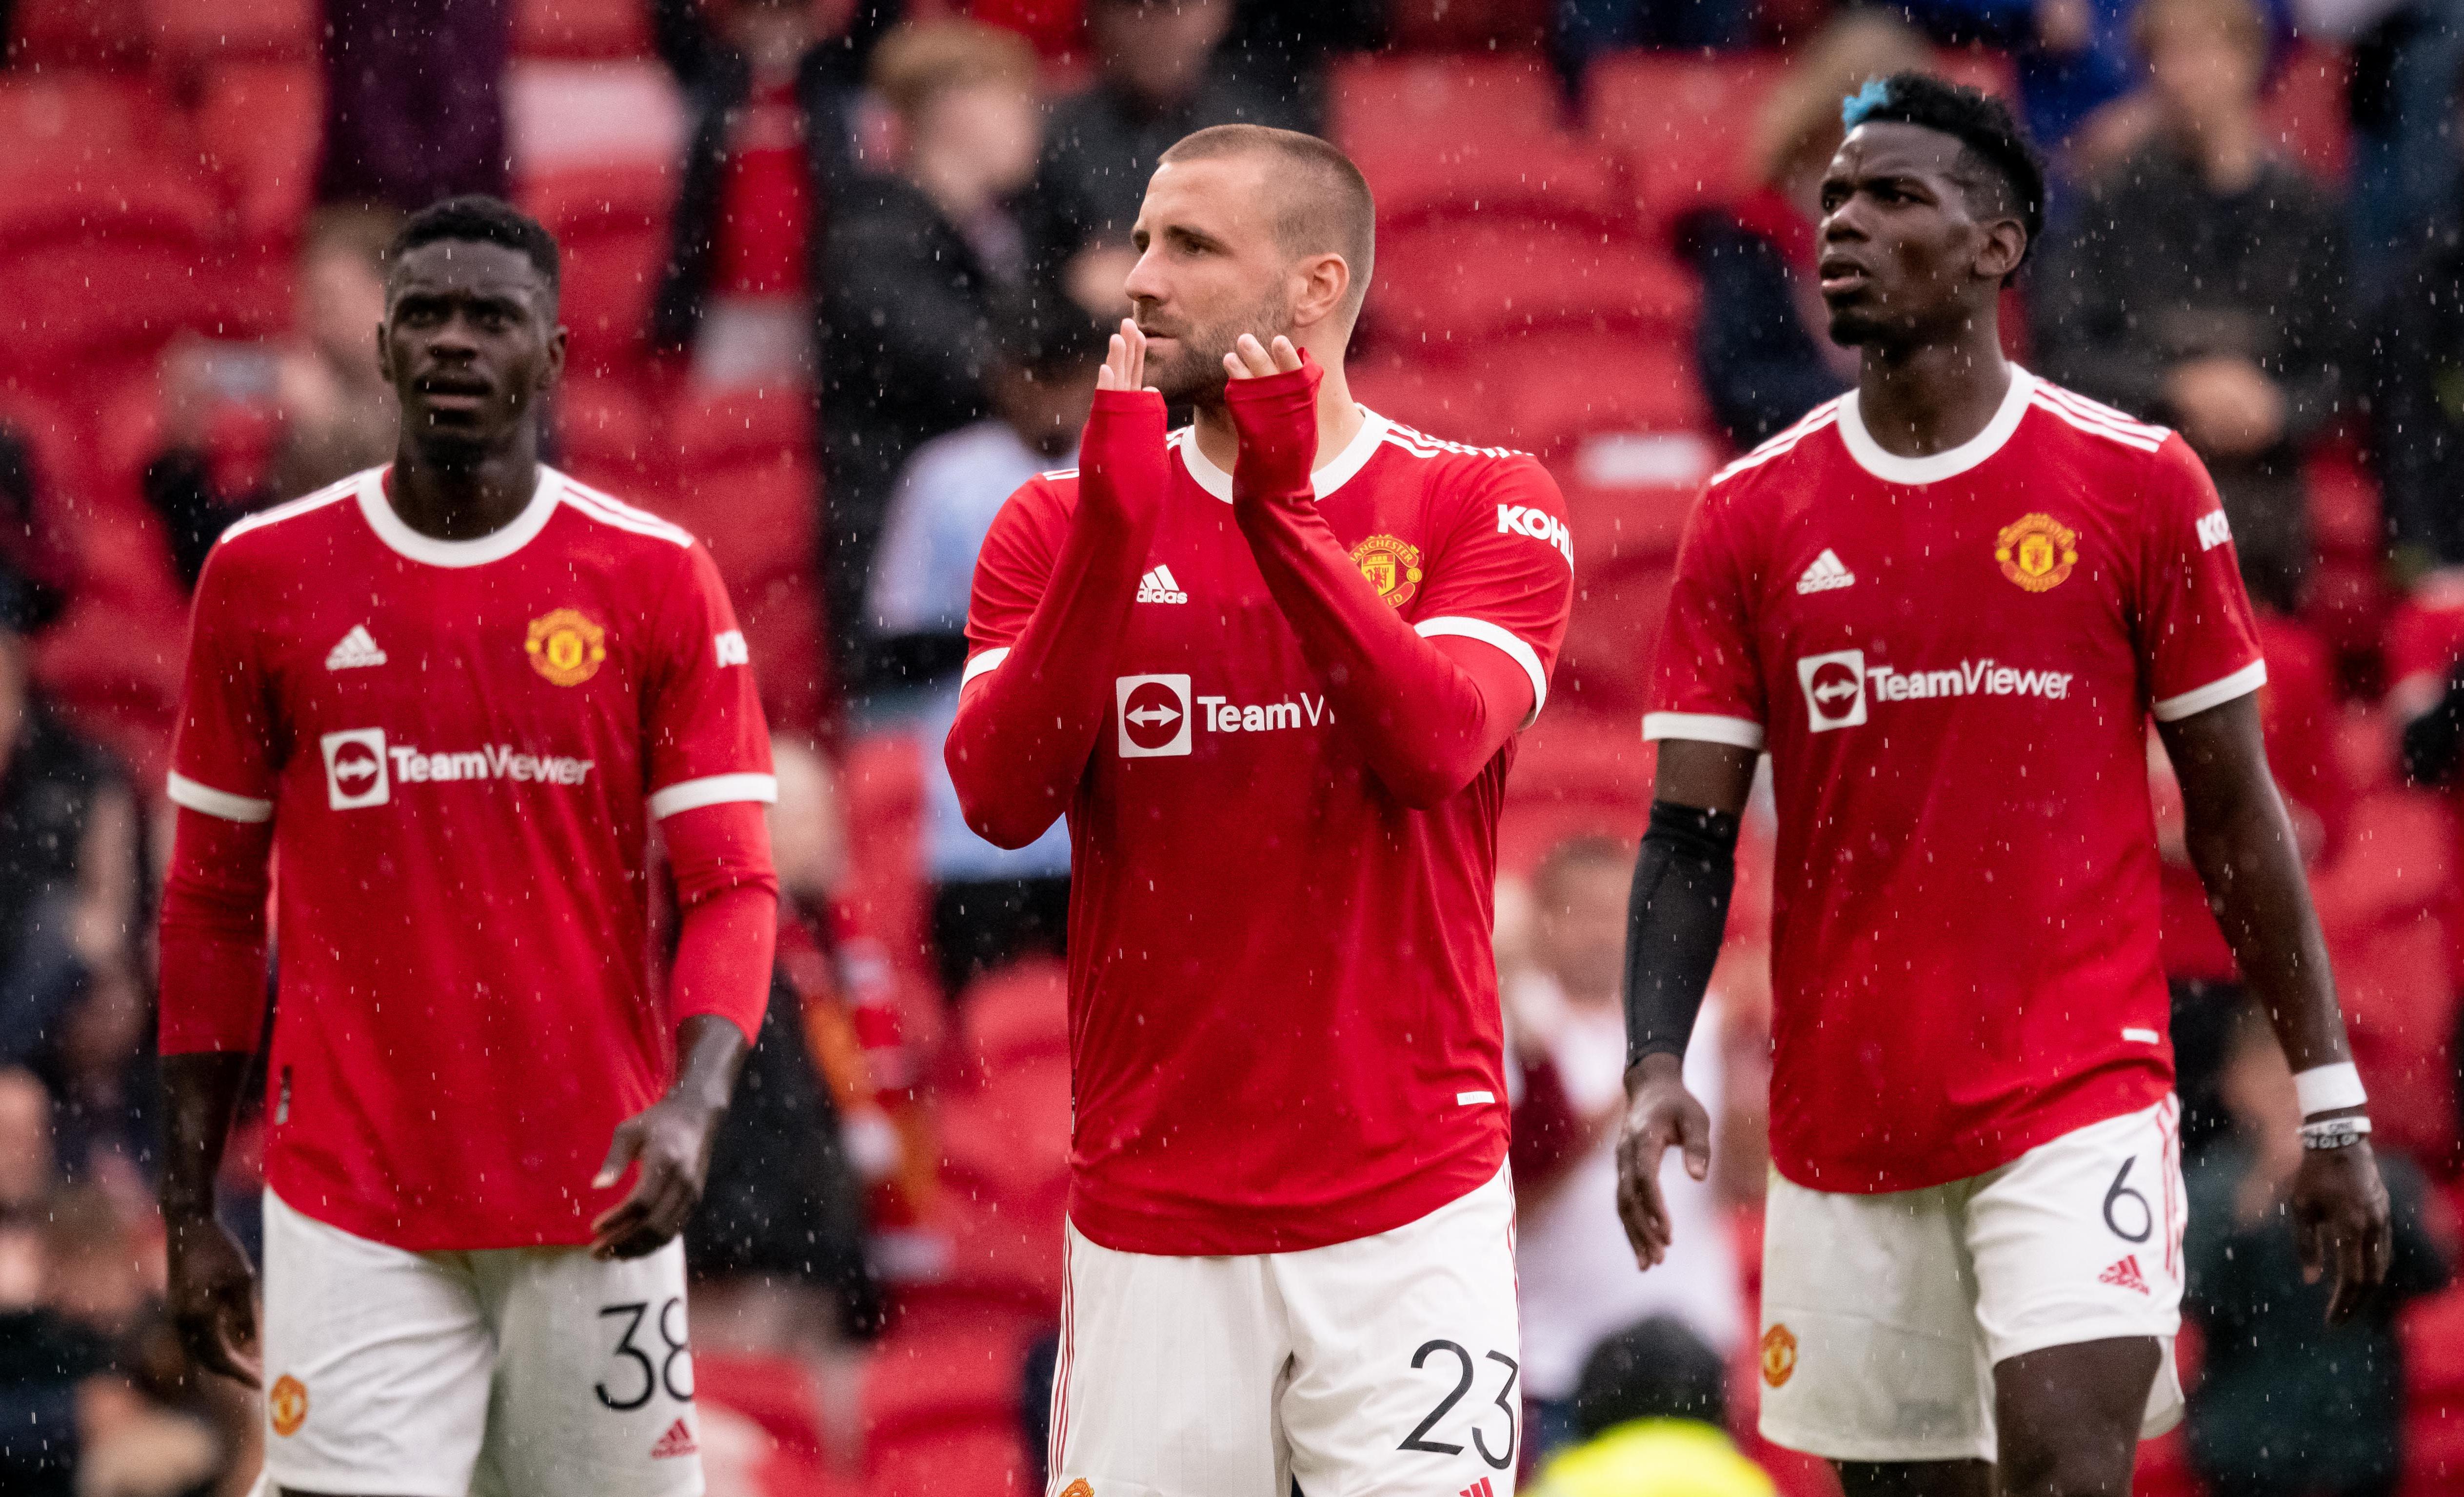 Luke Shaw - Manchester United - Premier League